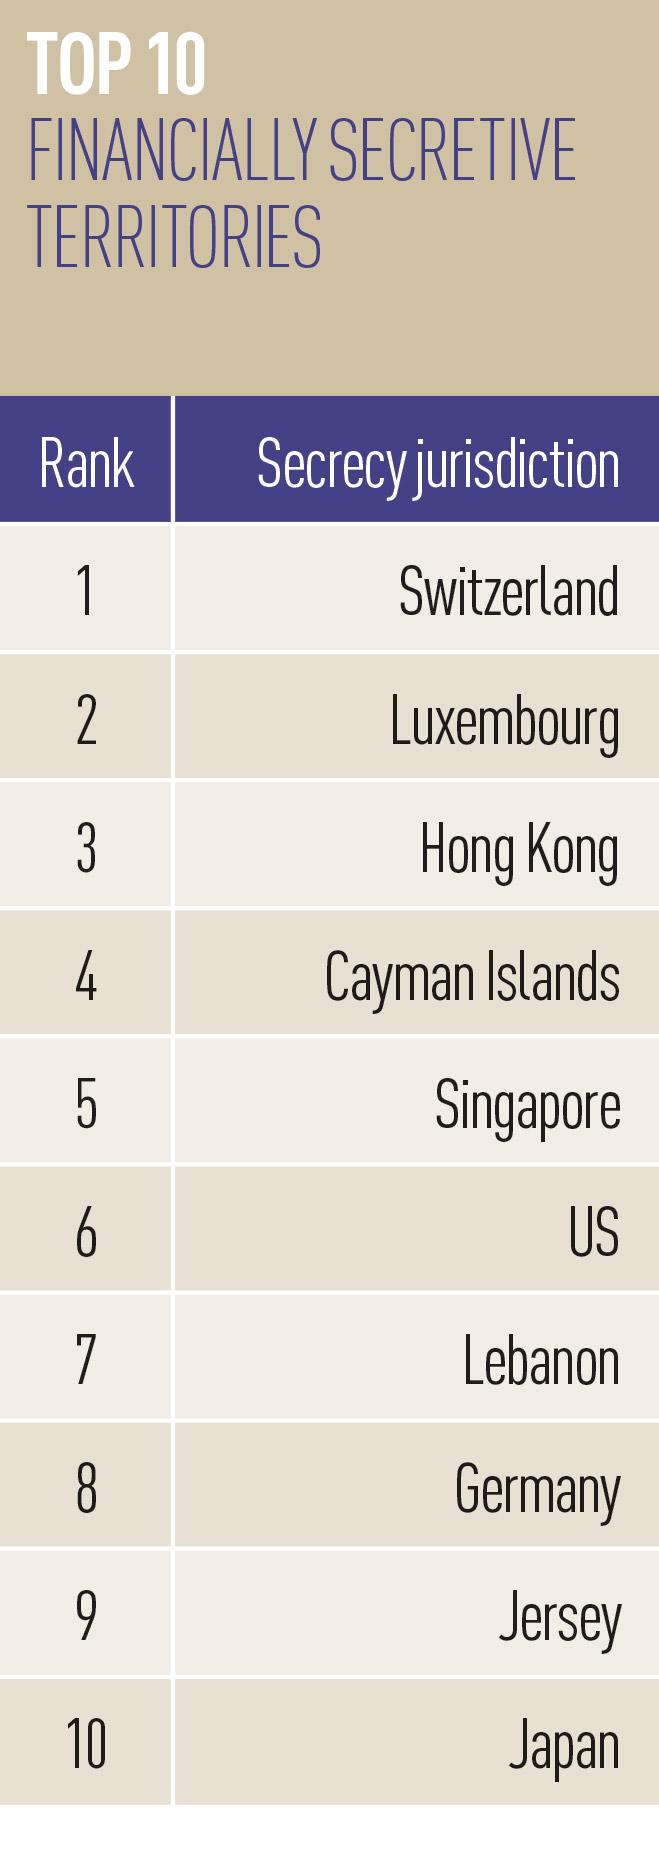 Top-10-financially-secretive-territories